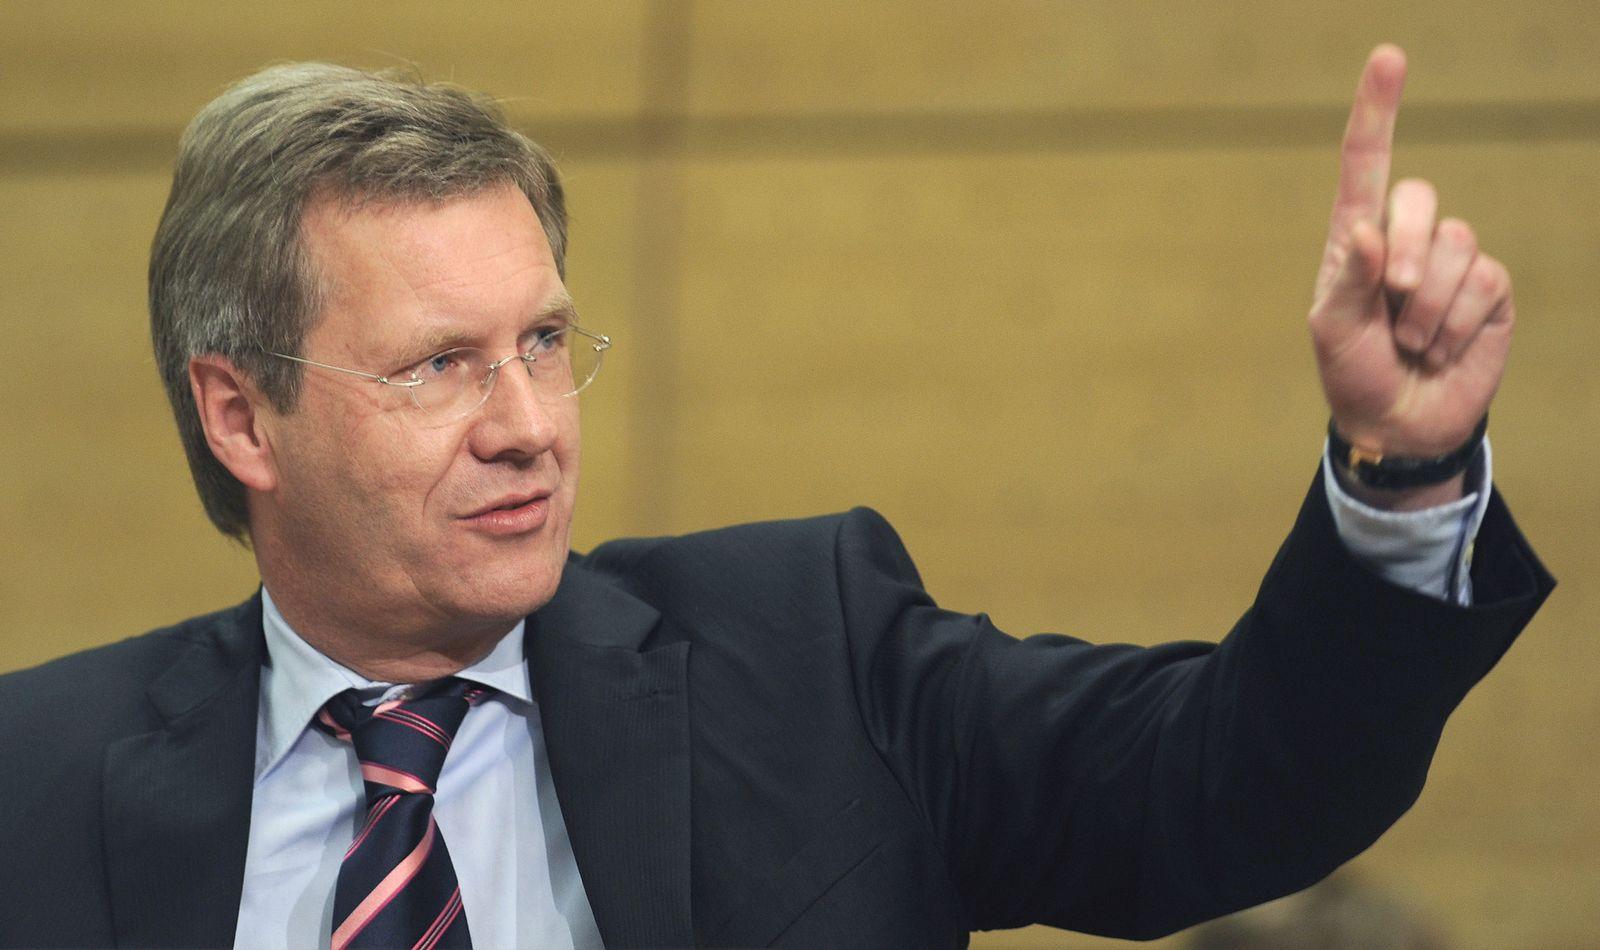 Landtag Hannover - Christian Wulff